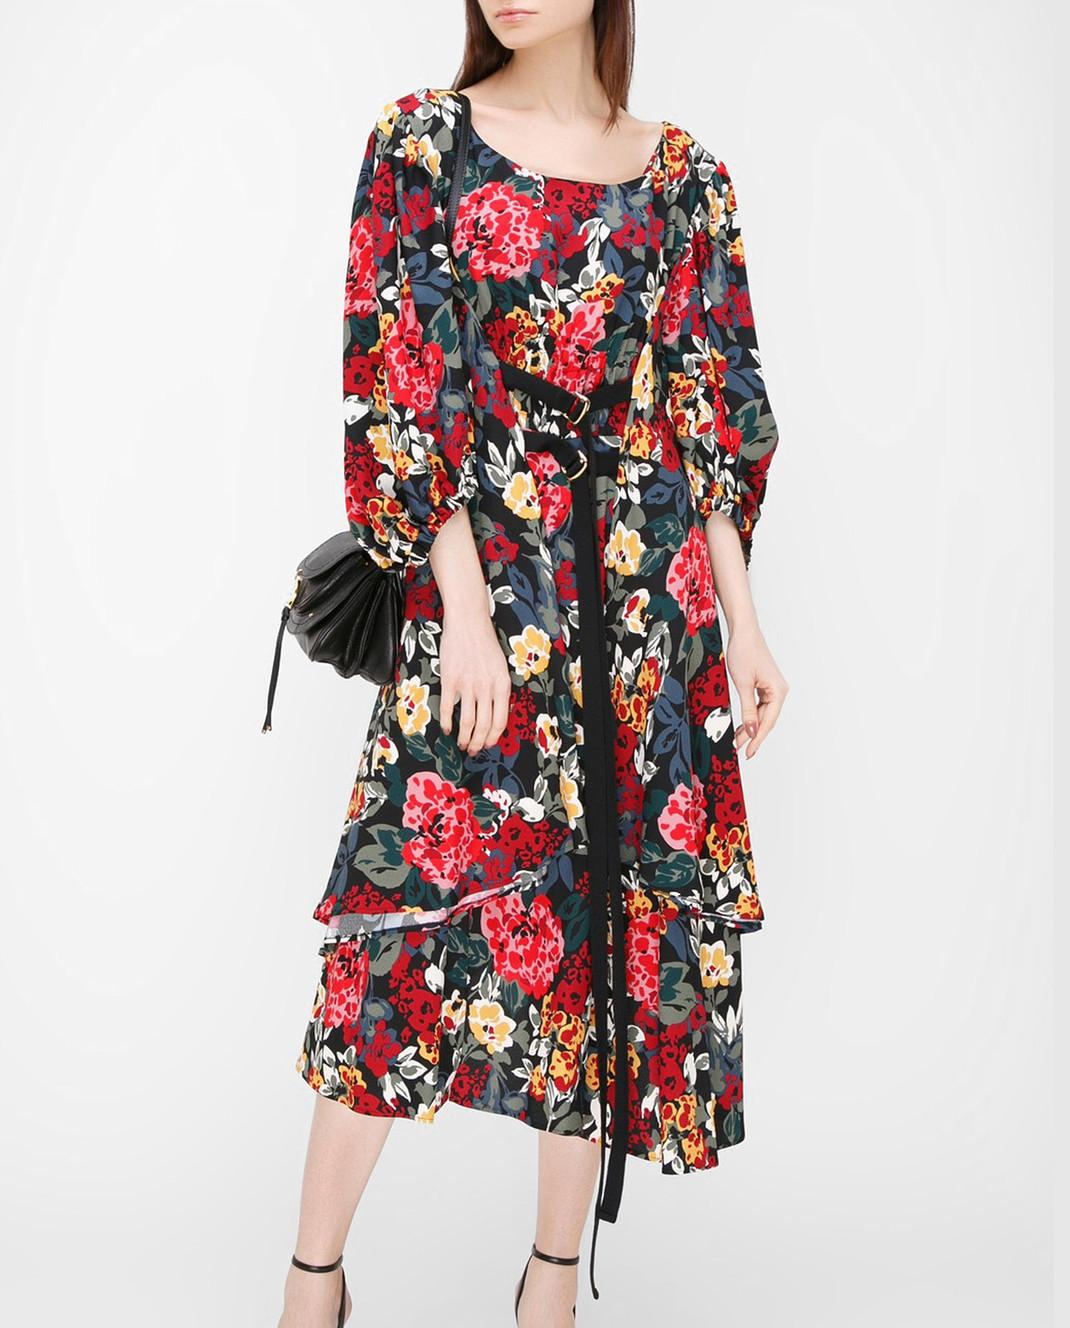 Sonia Rykiel Платье 17432403 изображение 2